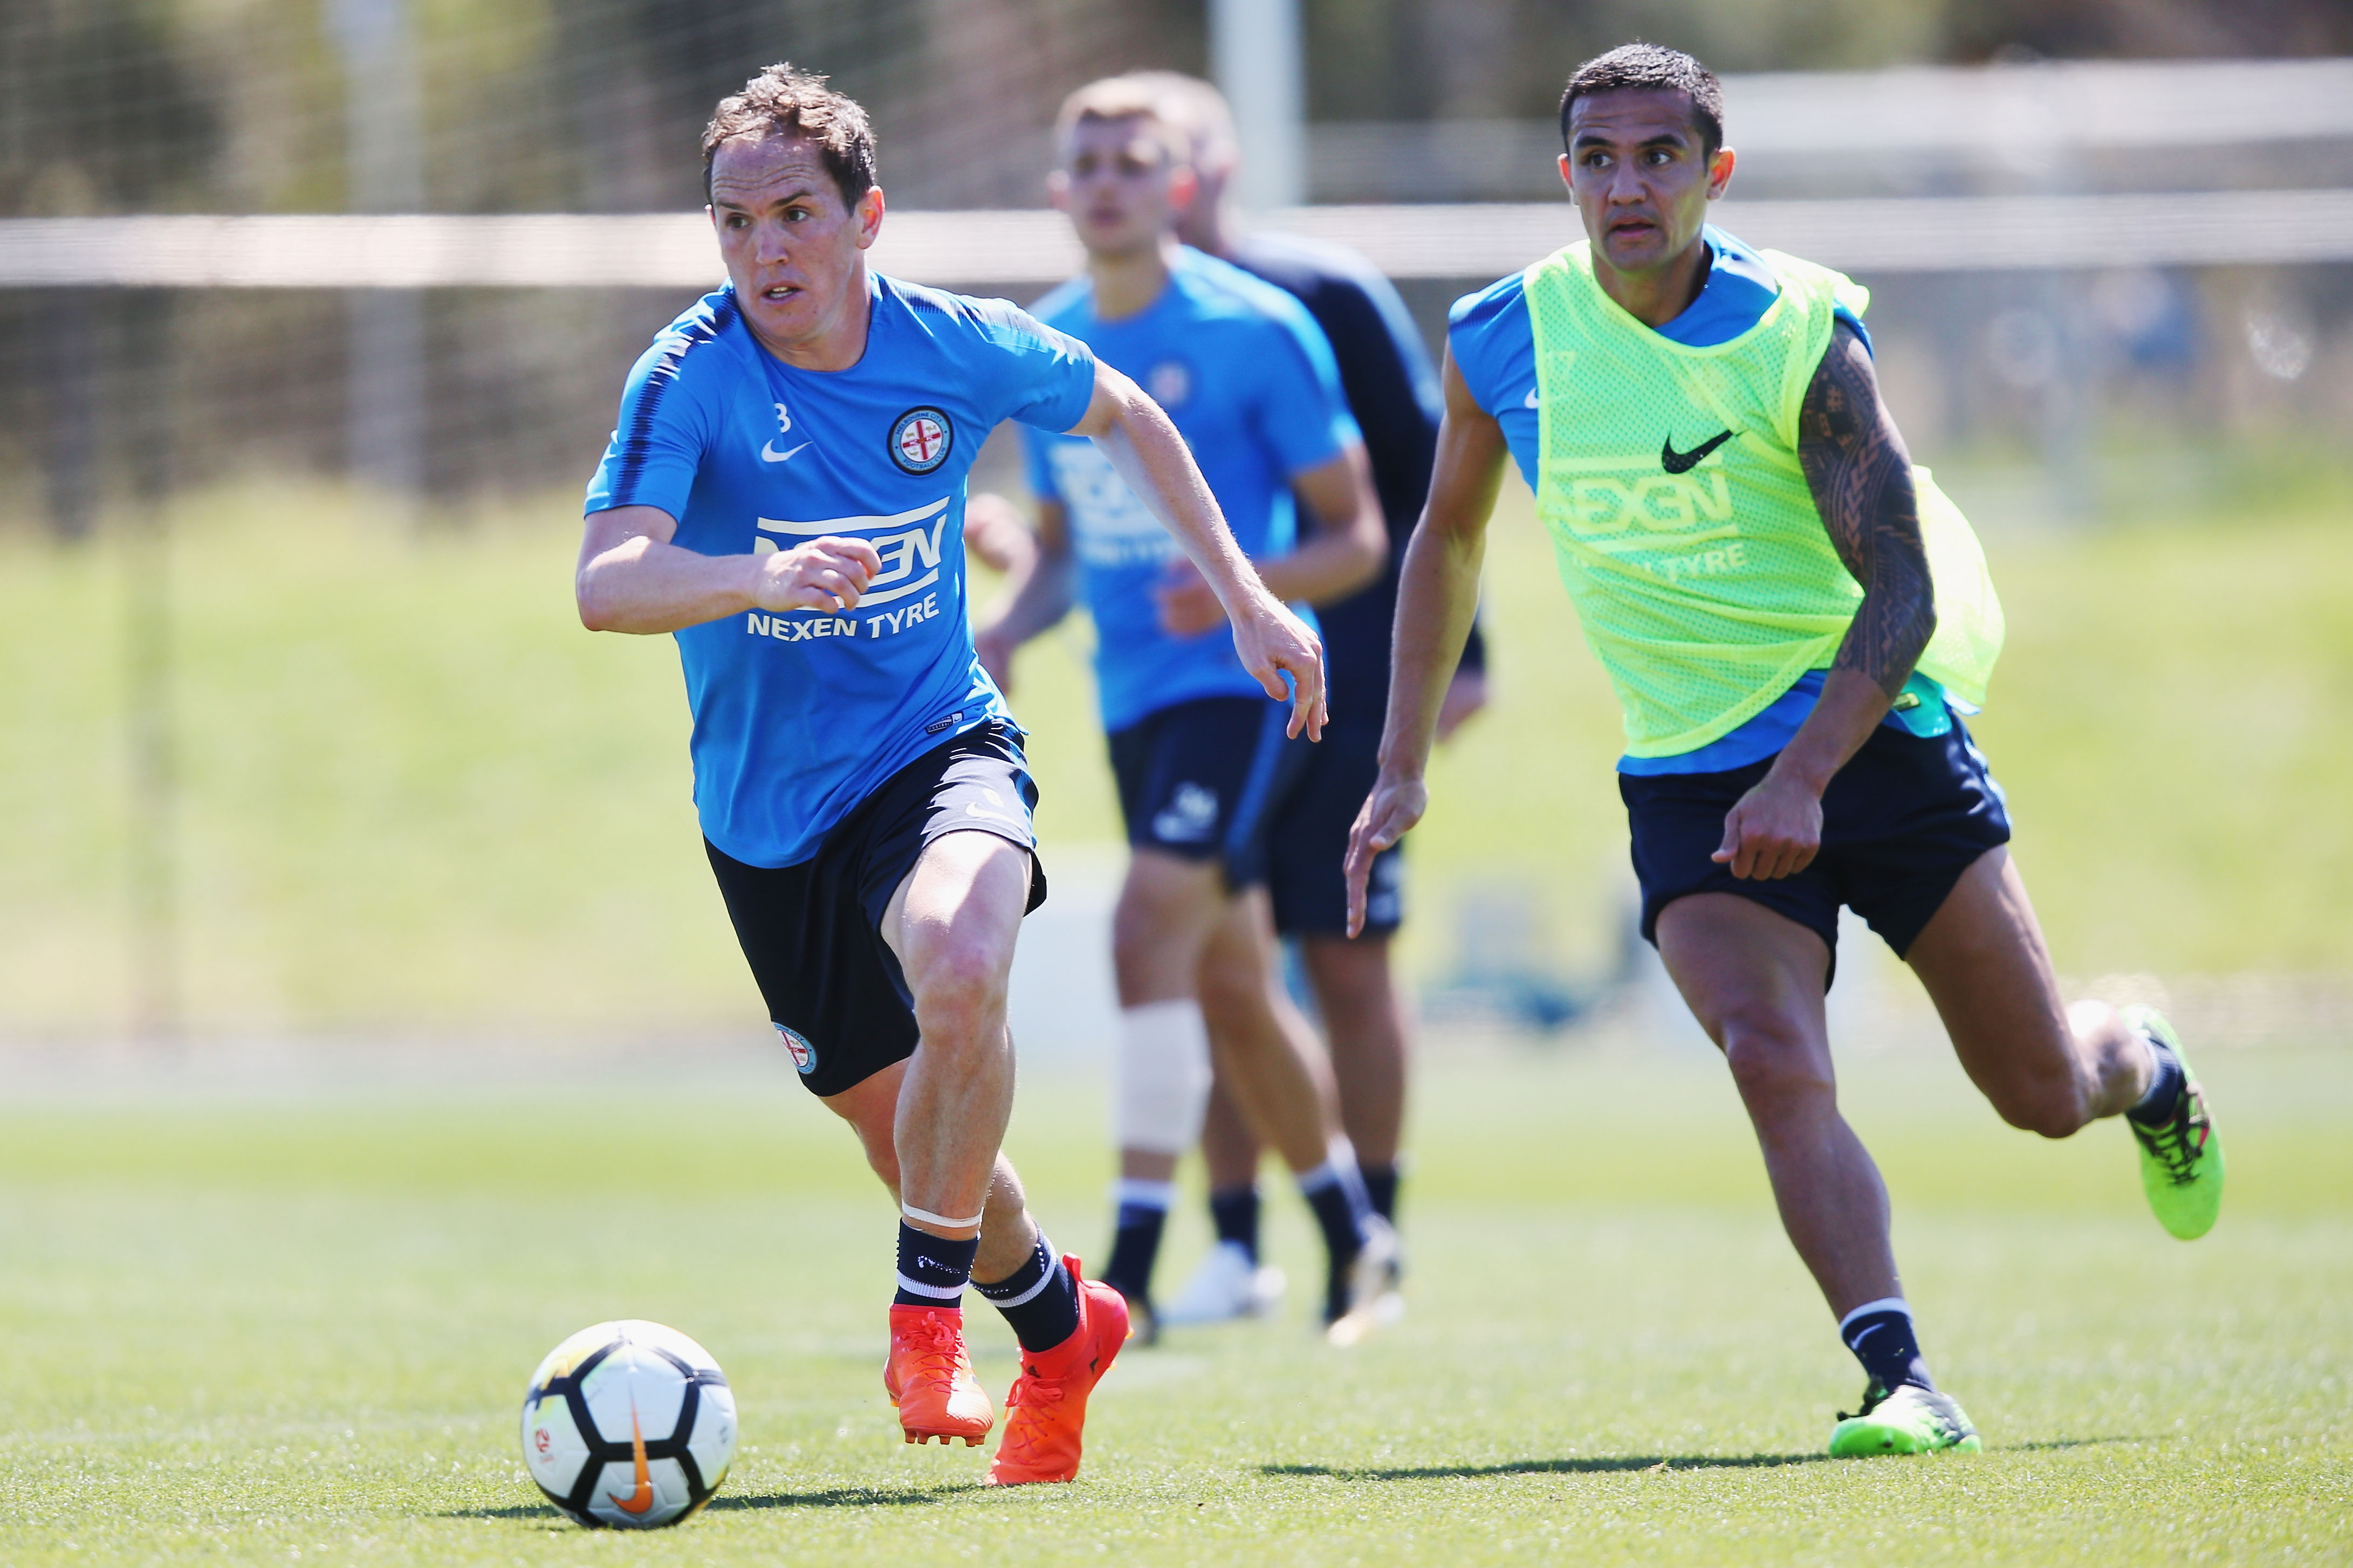 Melbourne City Training Session